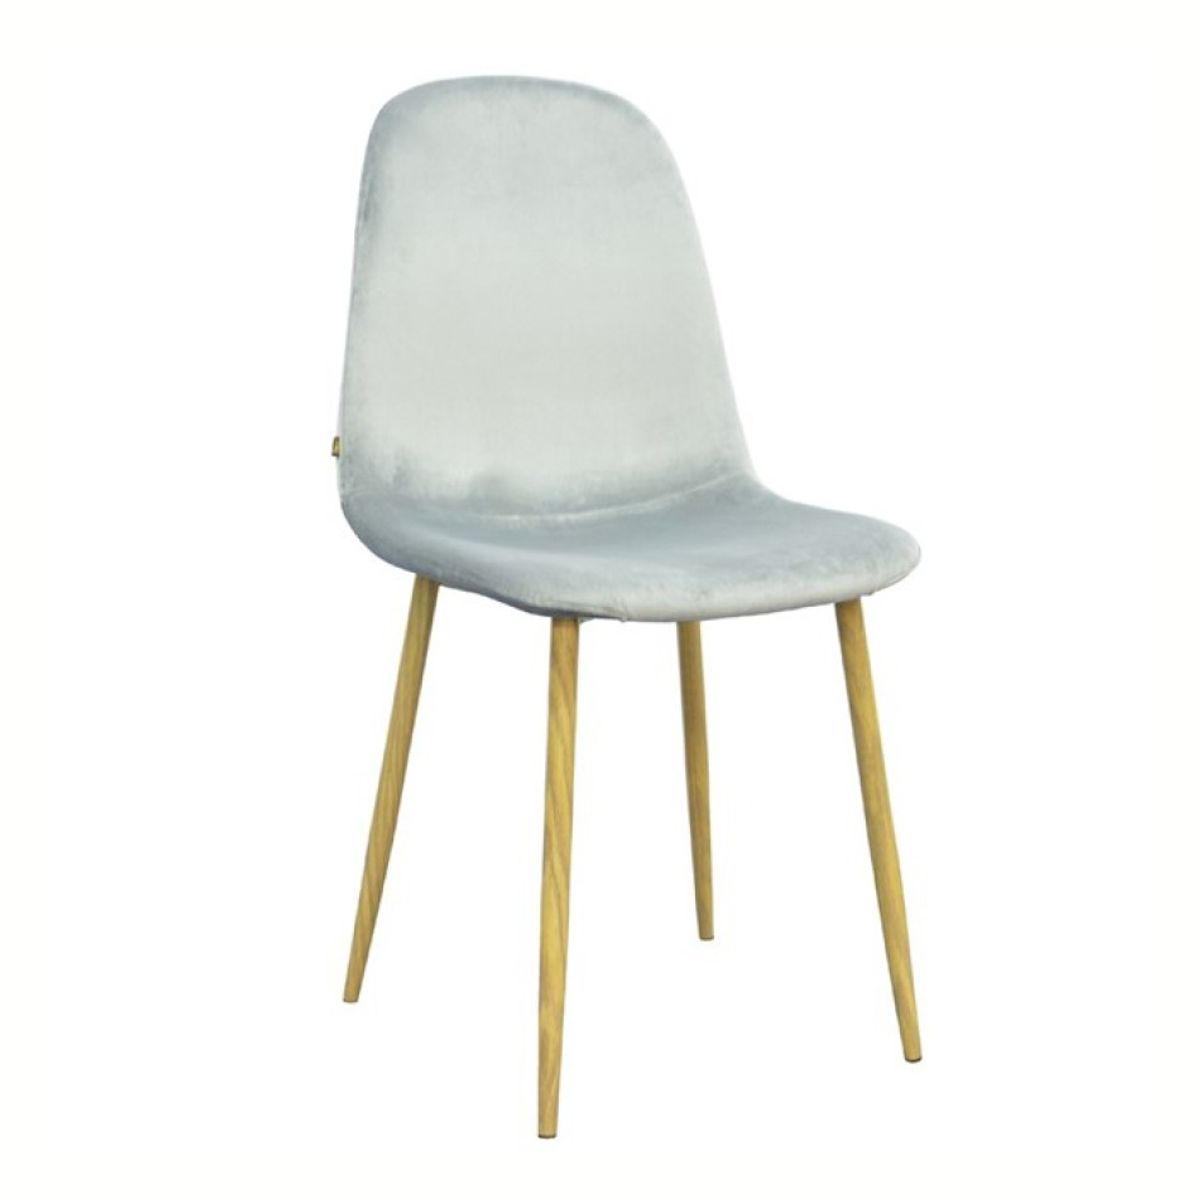 Chaise velours Stockholm gris